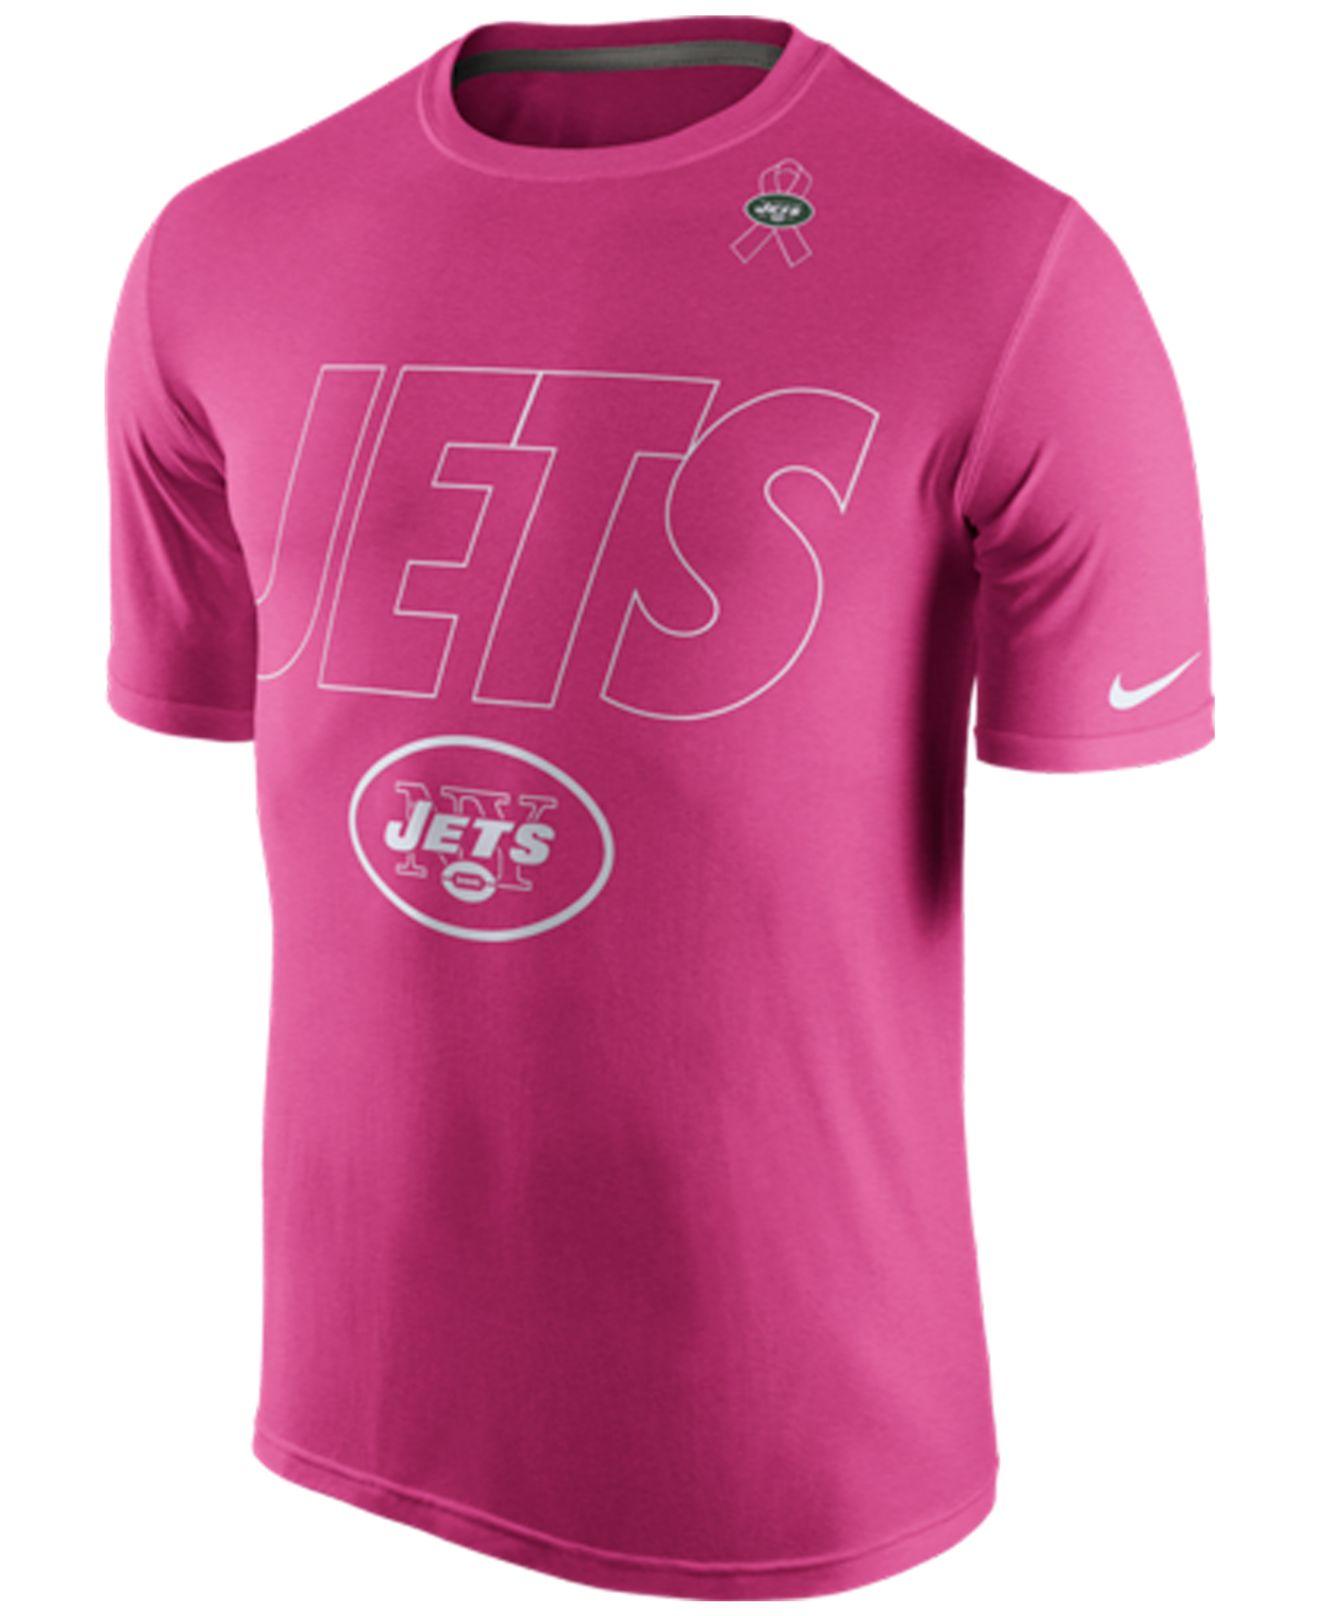 Breast Cancer Awareness T-Shirts - The Pink Ribbon Shop